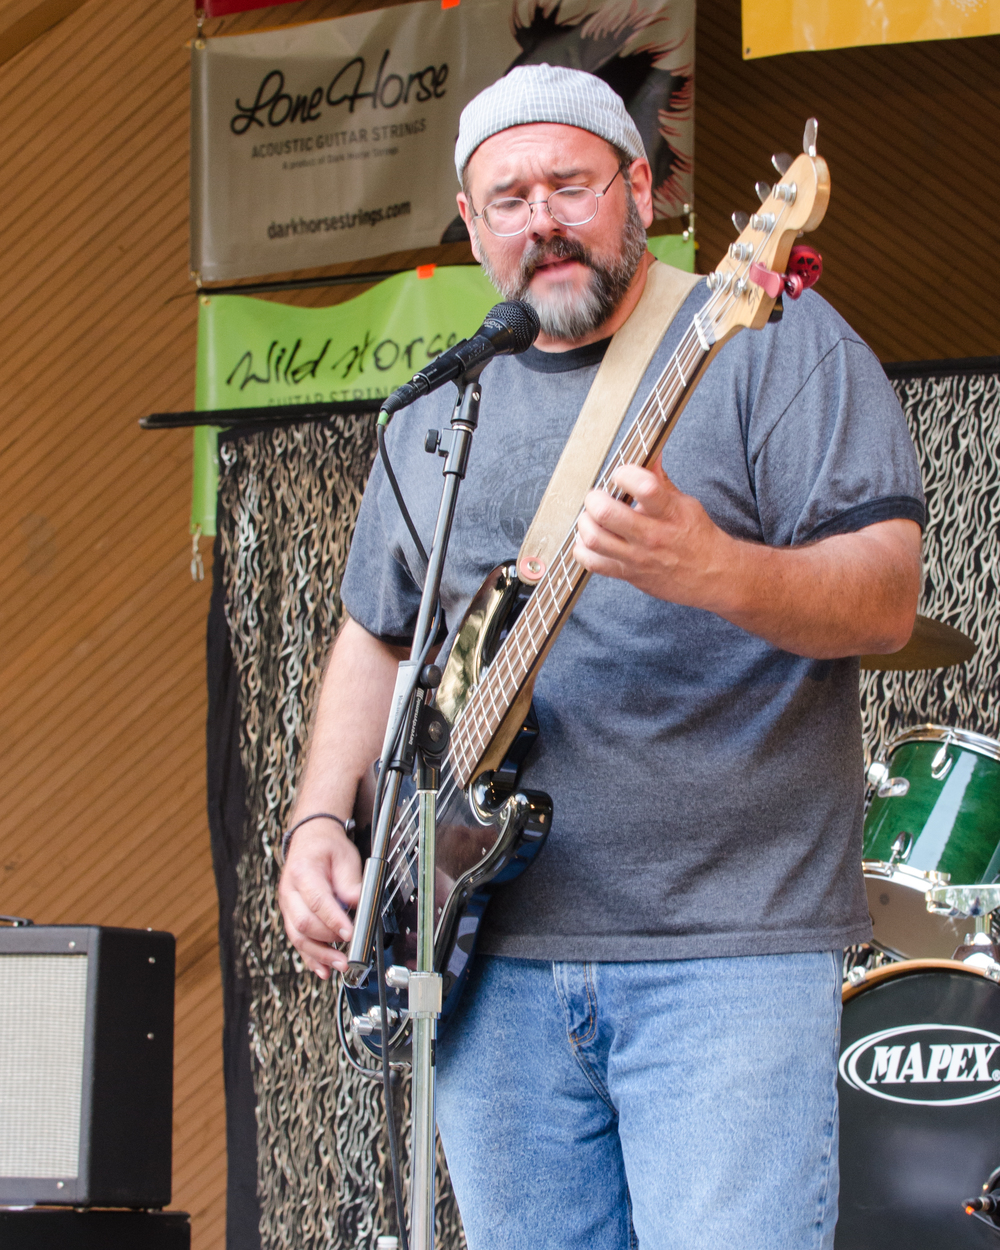 Fleetwood_Blues_Festival_2013-08-11_-411.jpg